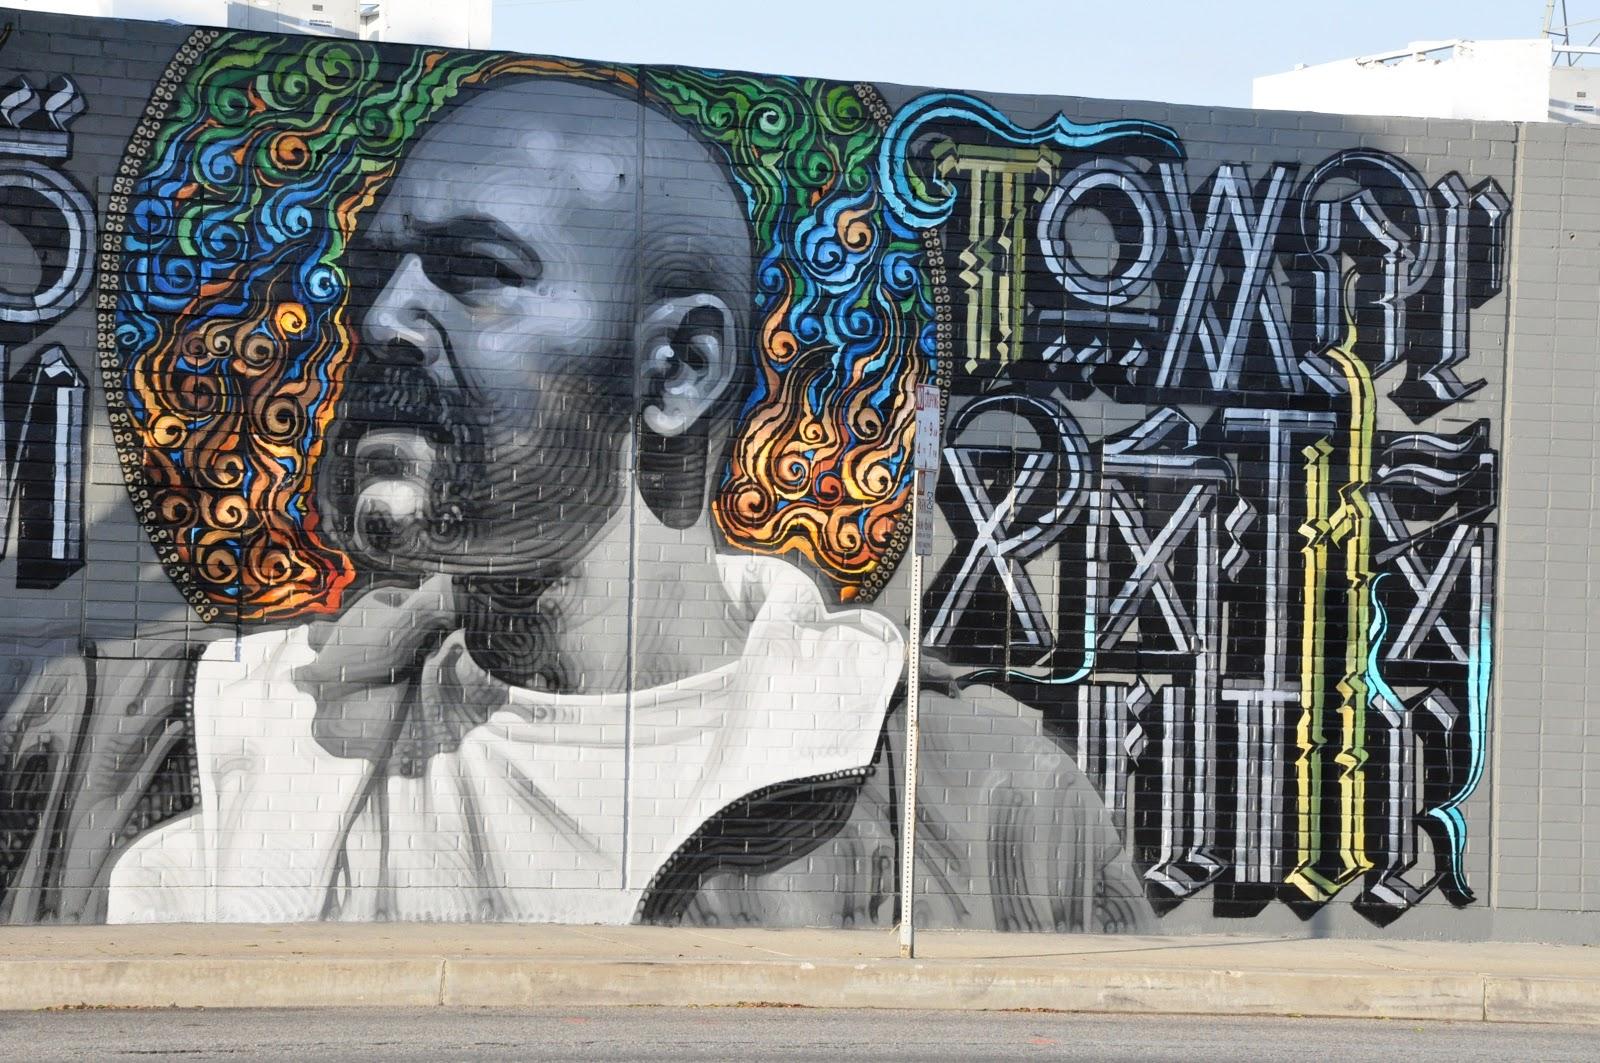 mural los angeles - graffiti mural art - mural artist los angeles